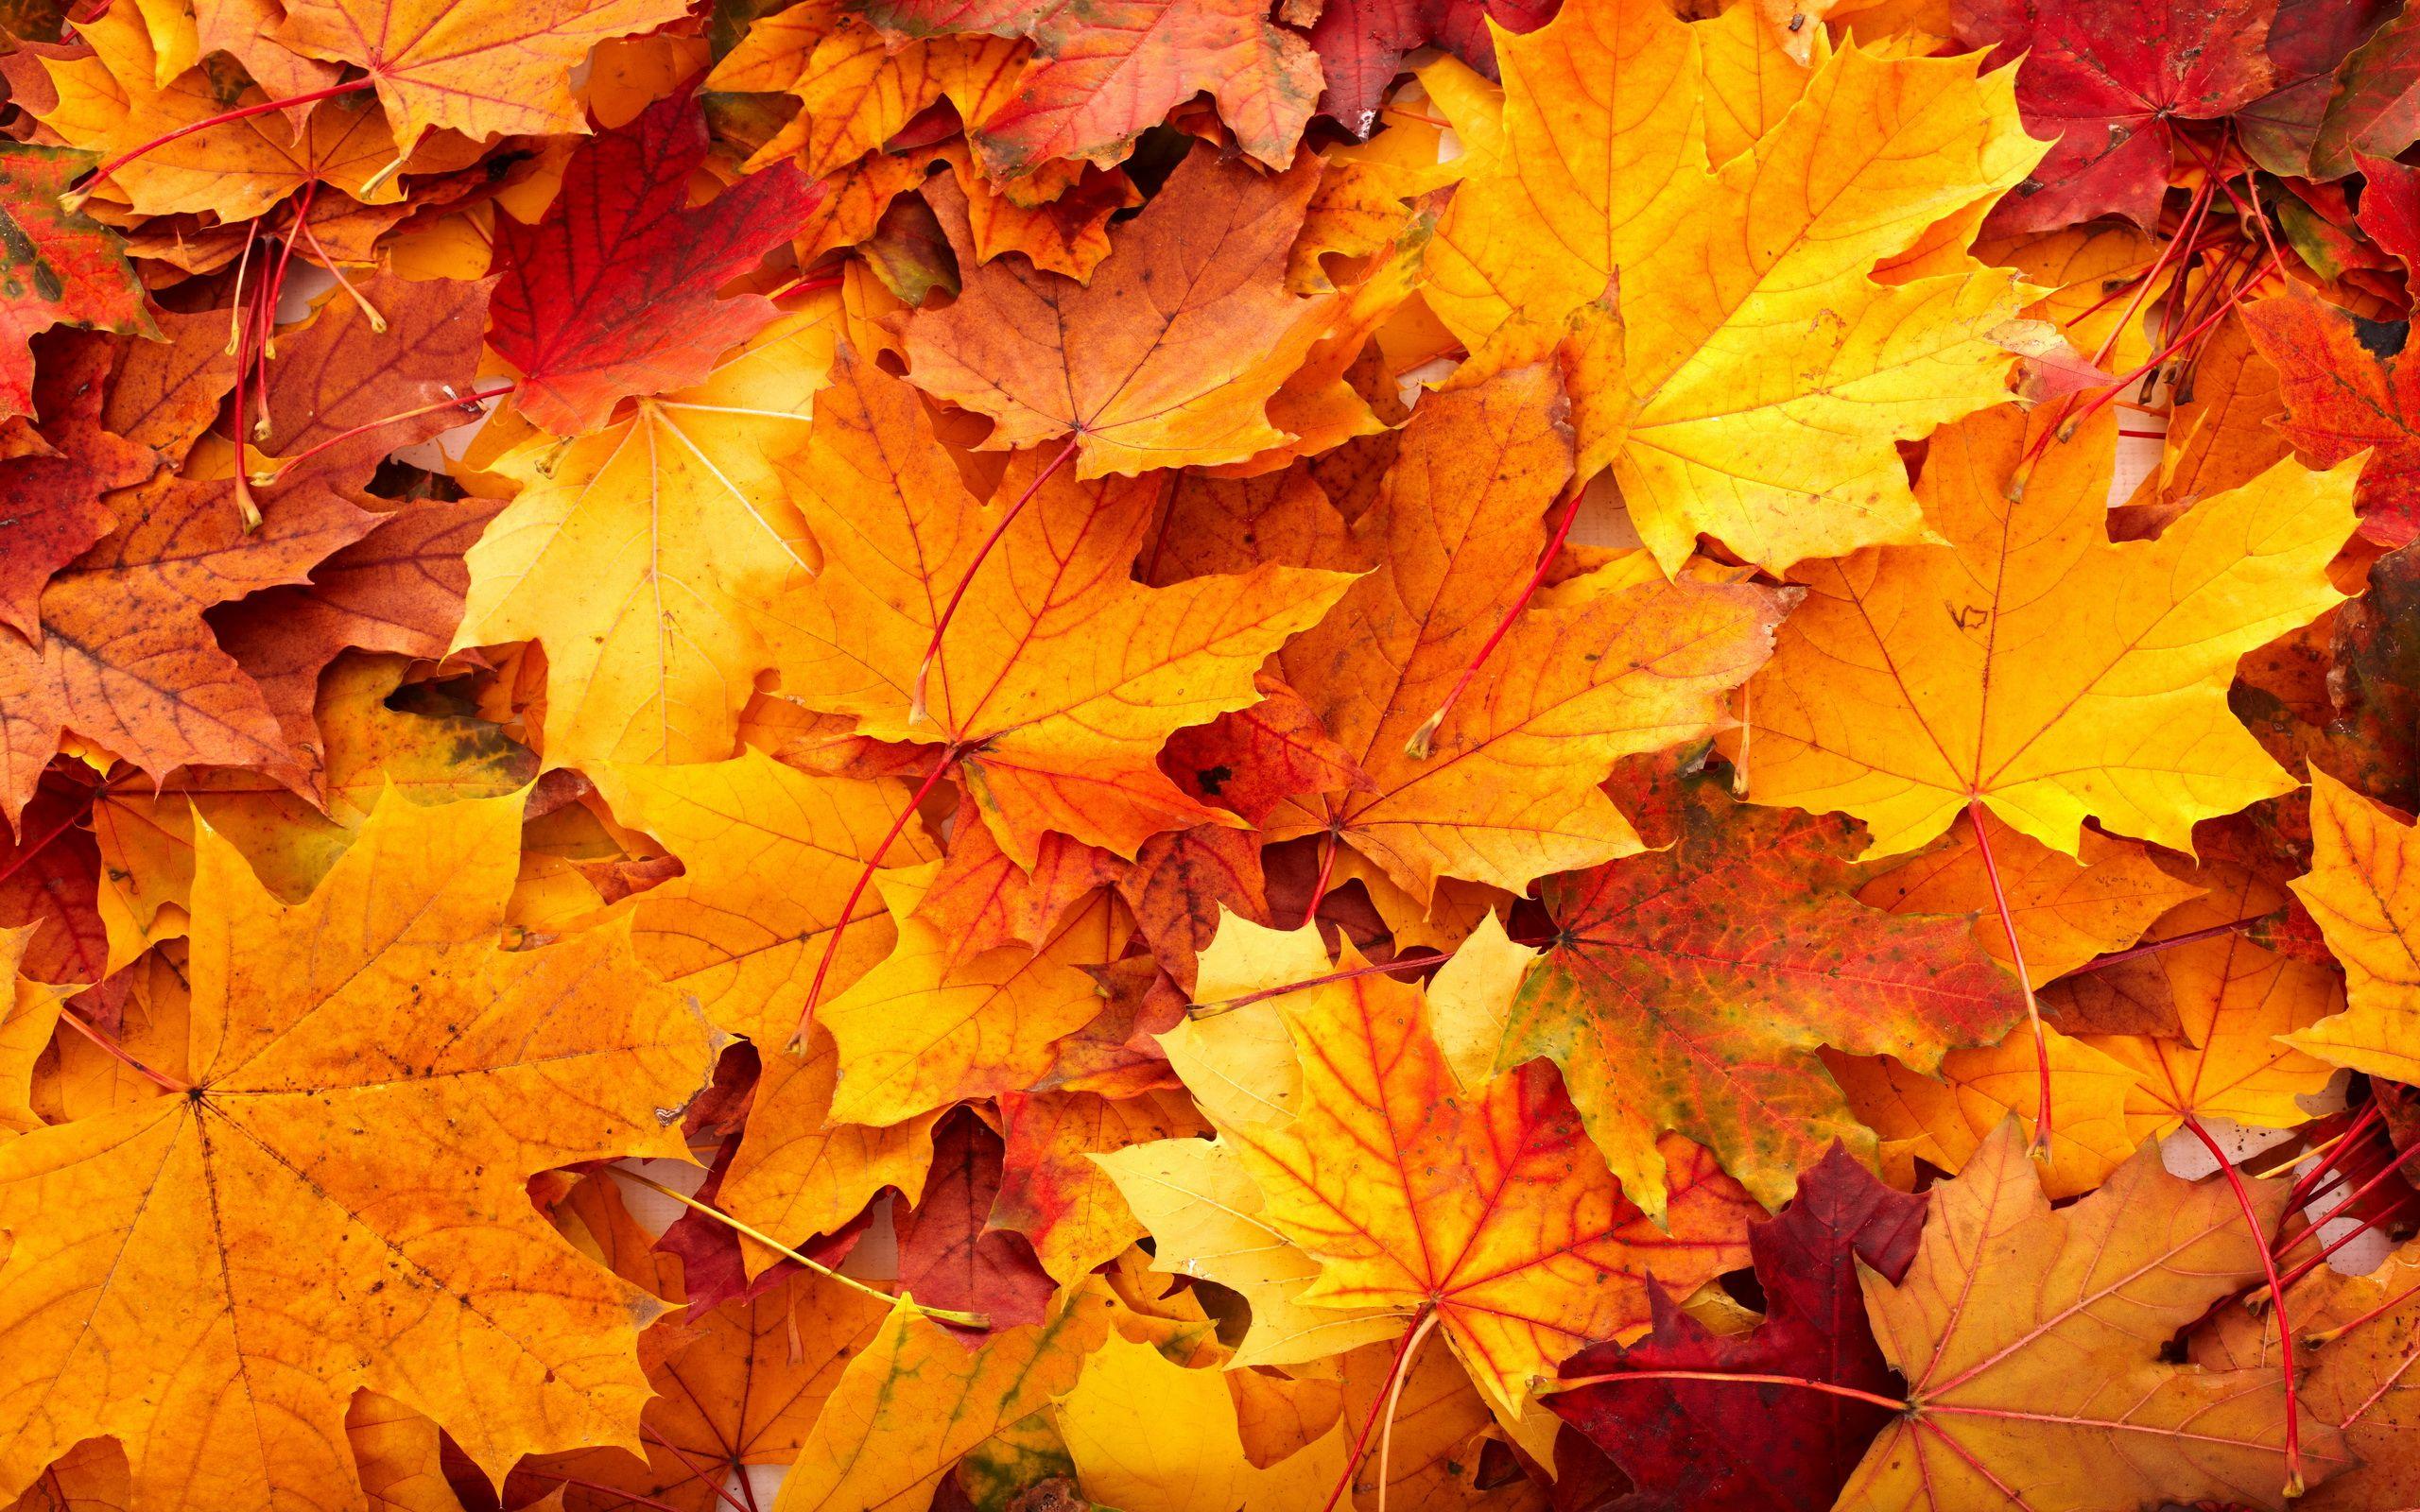 September Backgrounds Autumn Wallpapers Autumn Fall Nature